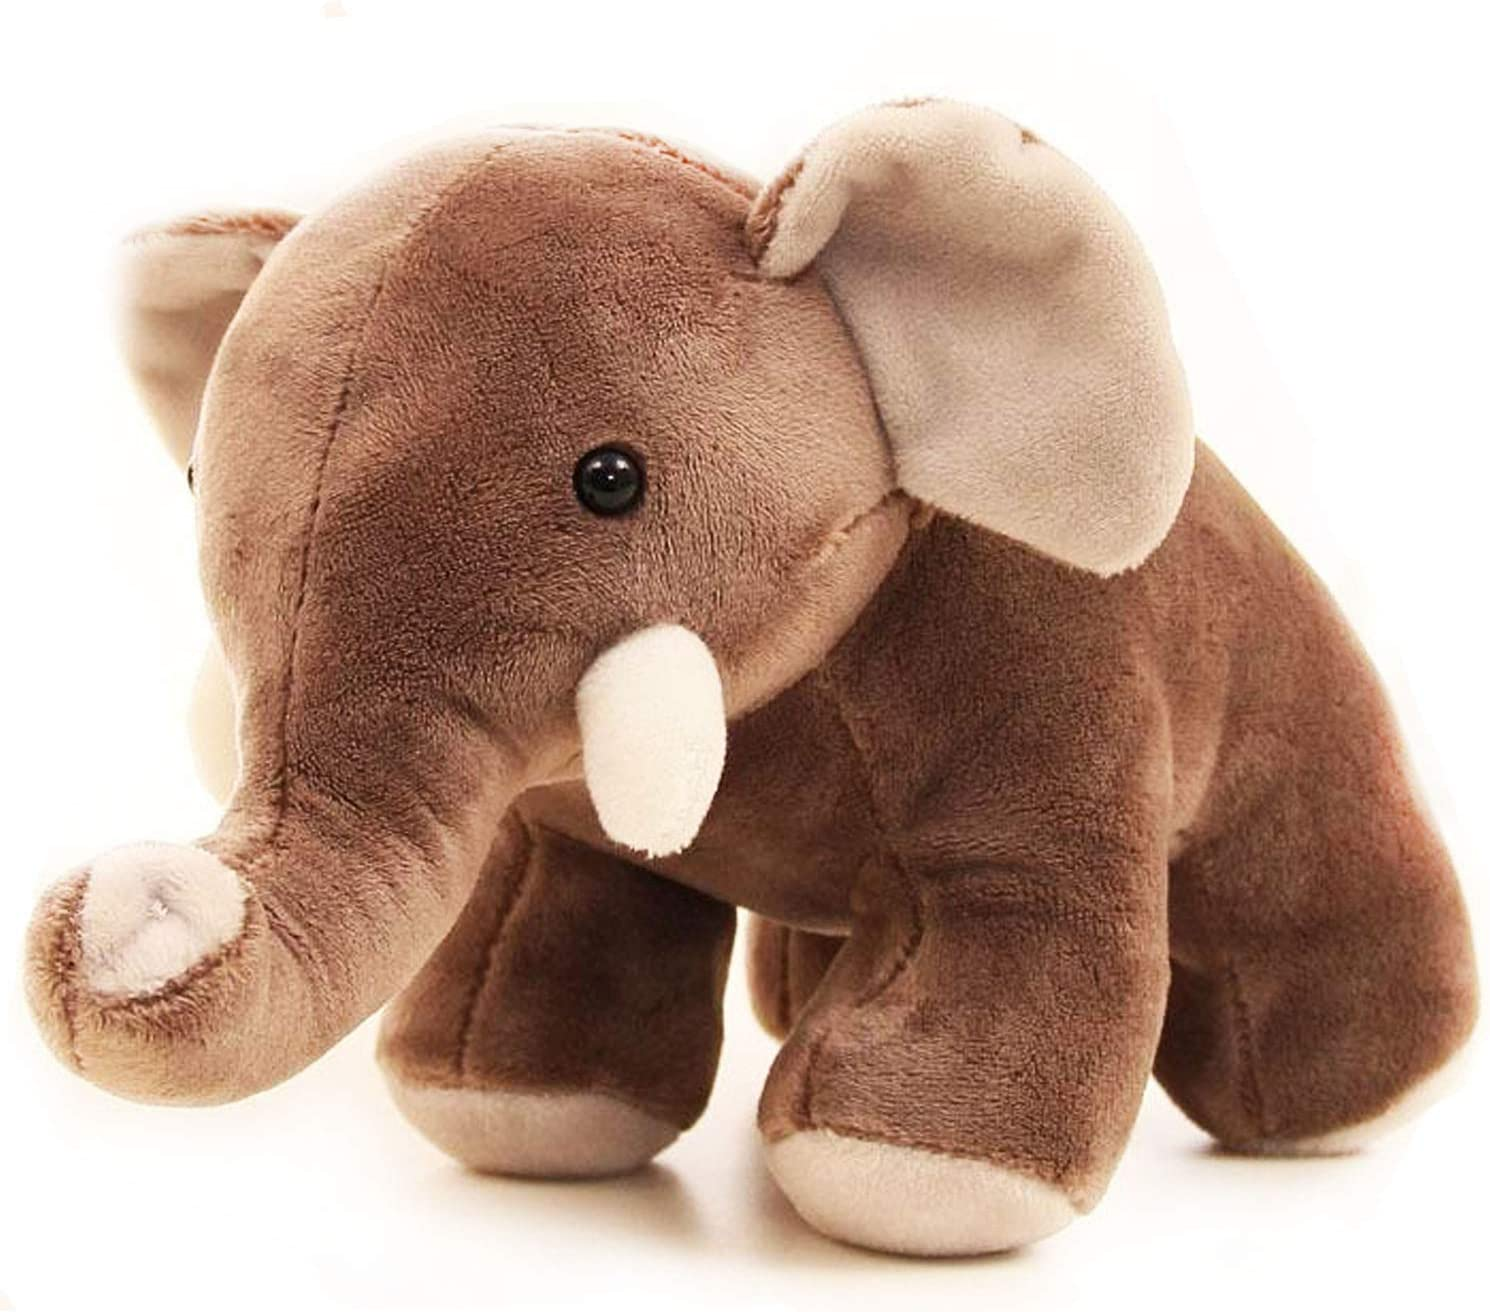 Stuffed Elephant BROWN Stuffed Animal